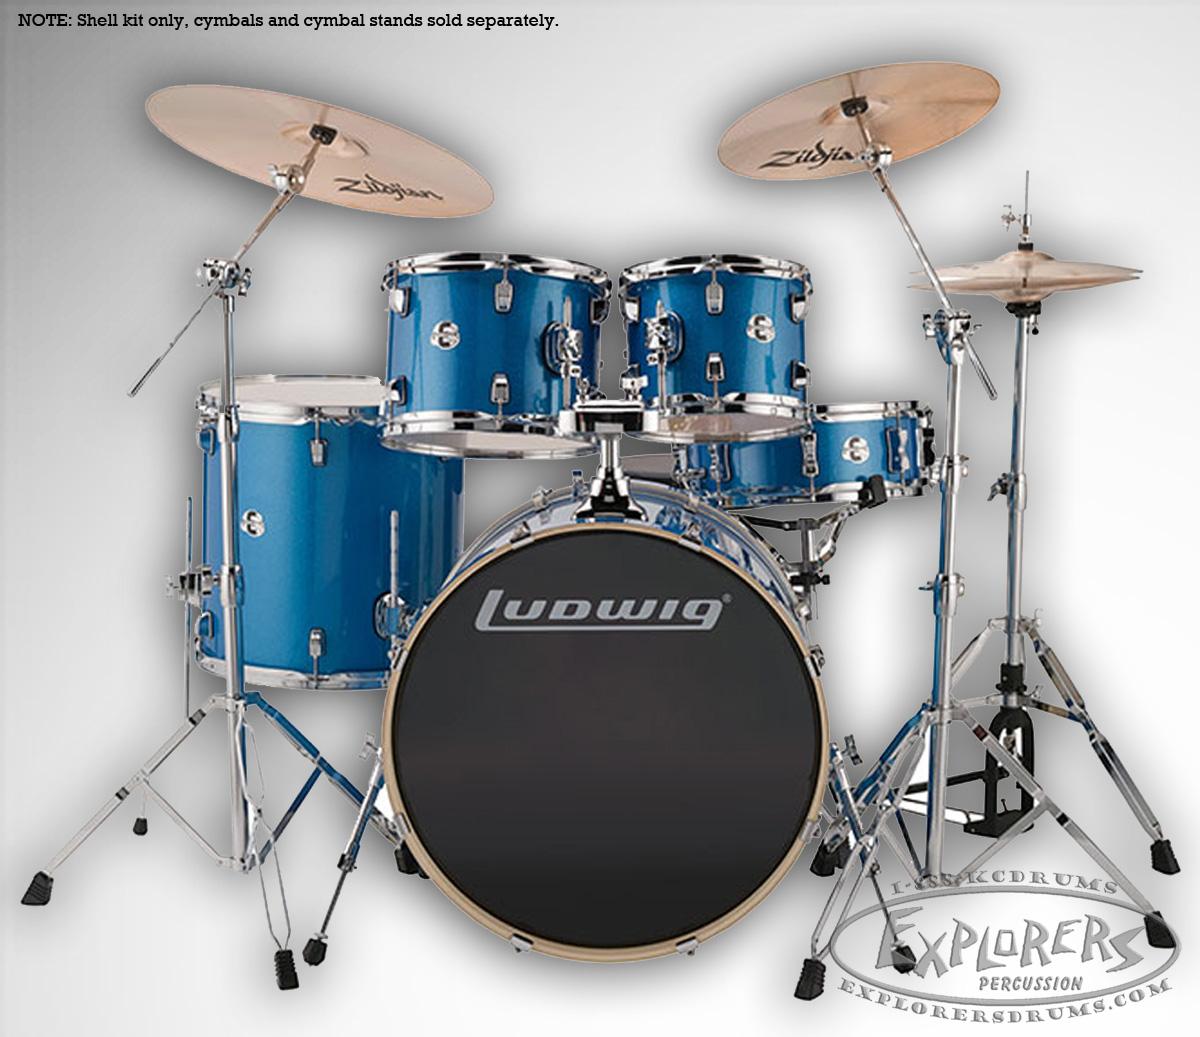 ludwig element evolution 5 piece complete drum set w hardware zildjian zbt cymbal pack. Black Bedroom Furniture Sets. Home Design Ideas